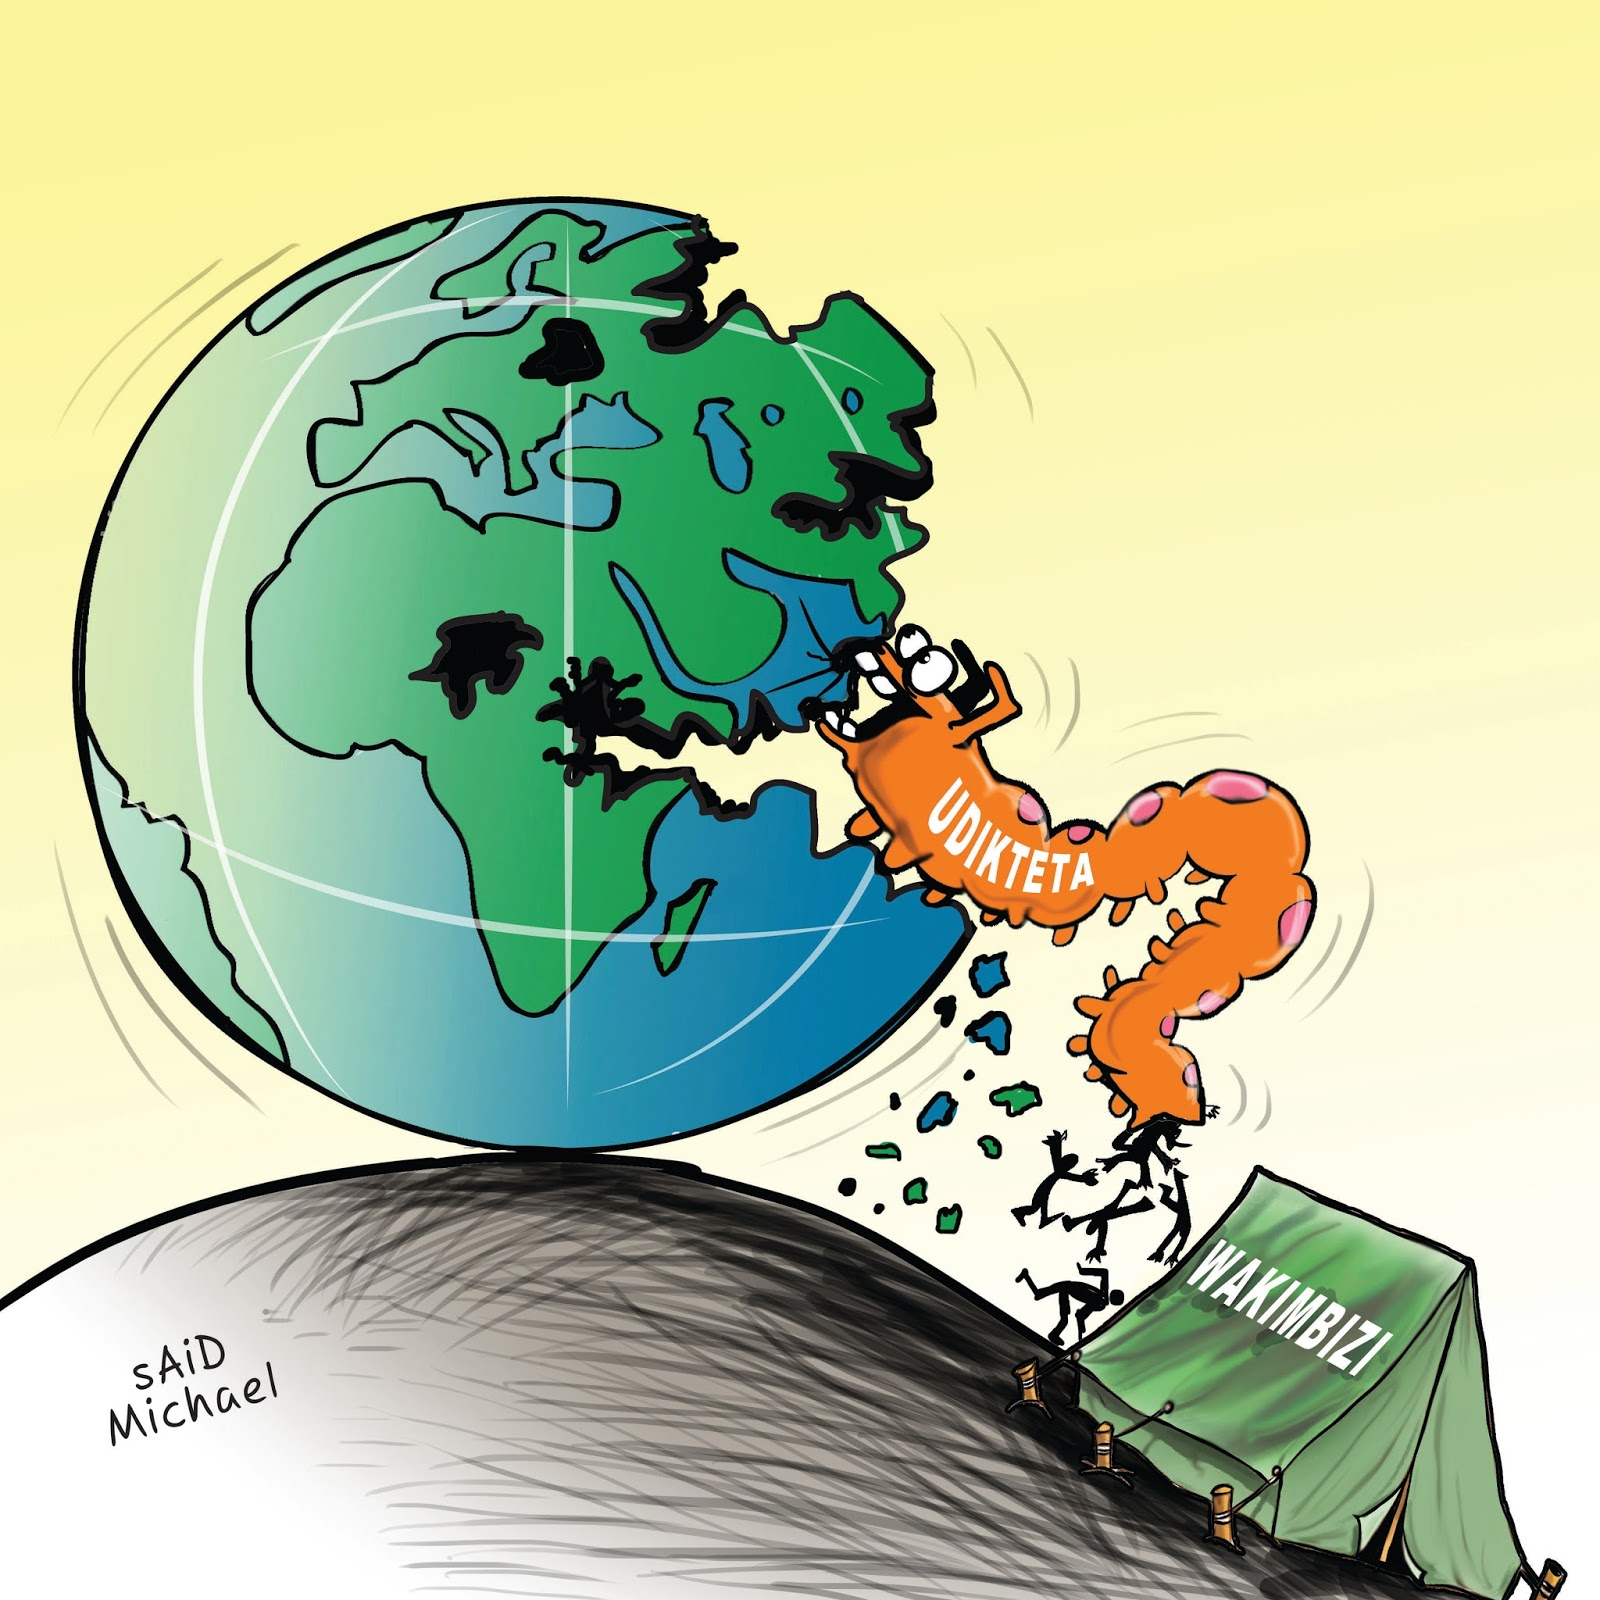 Image result for said michael cartoon